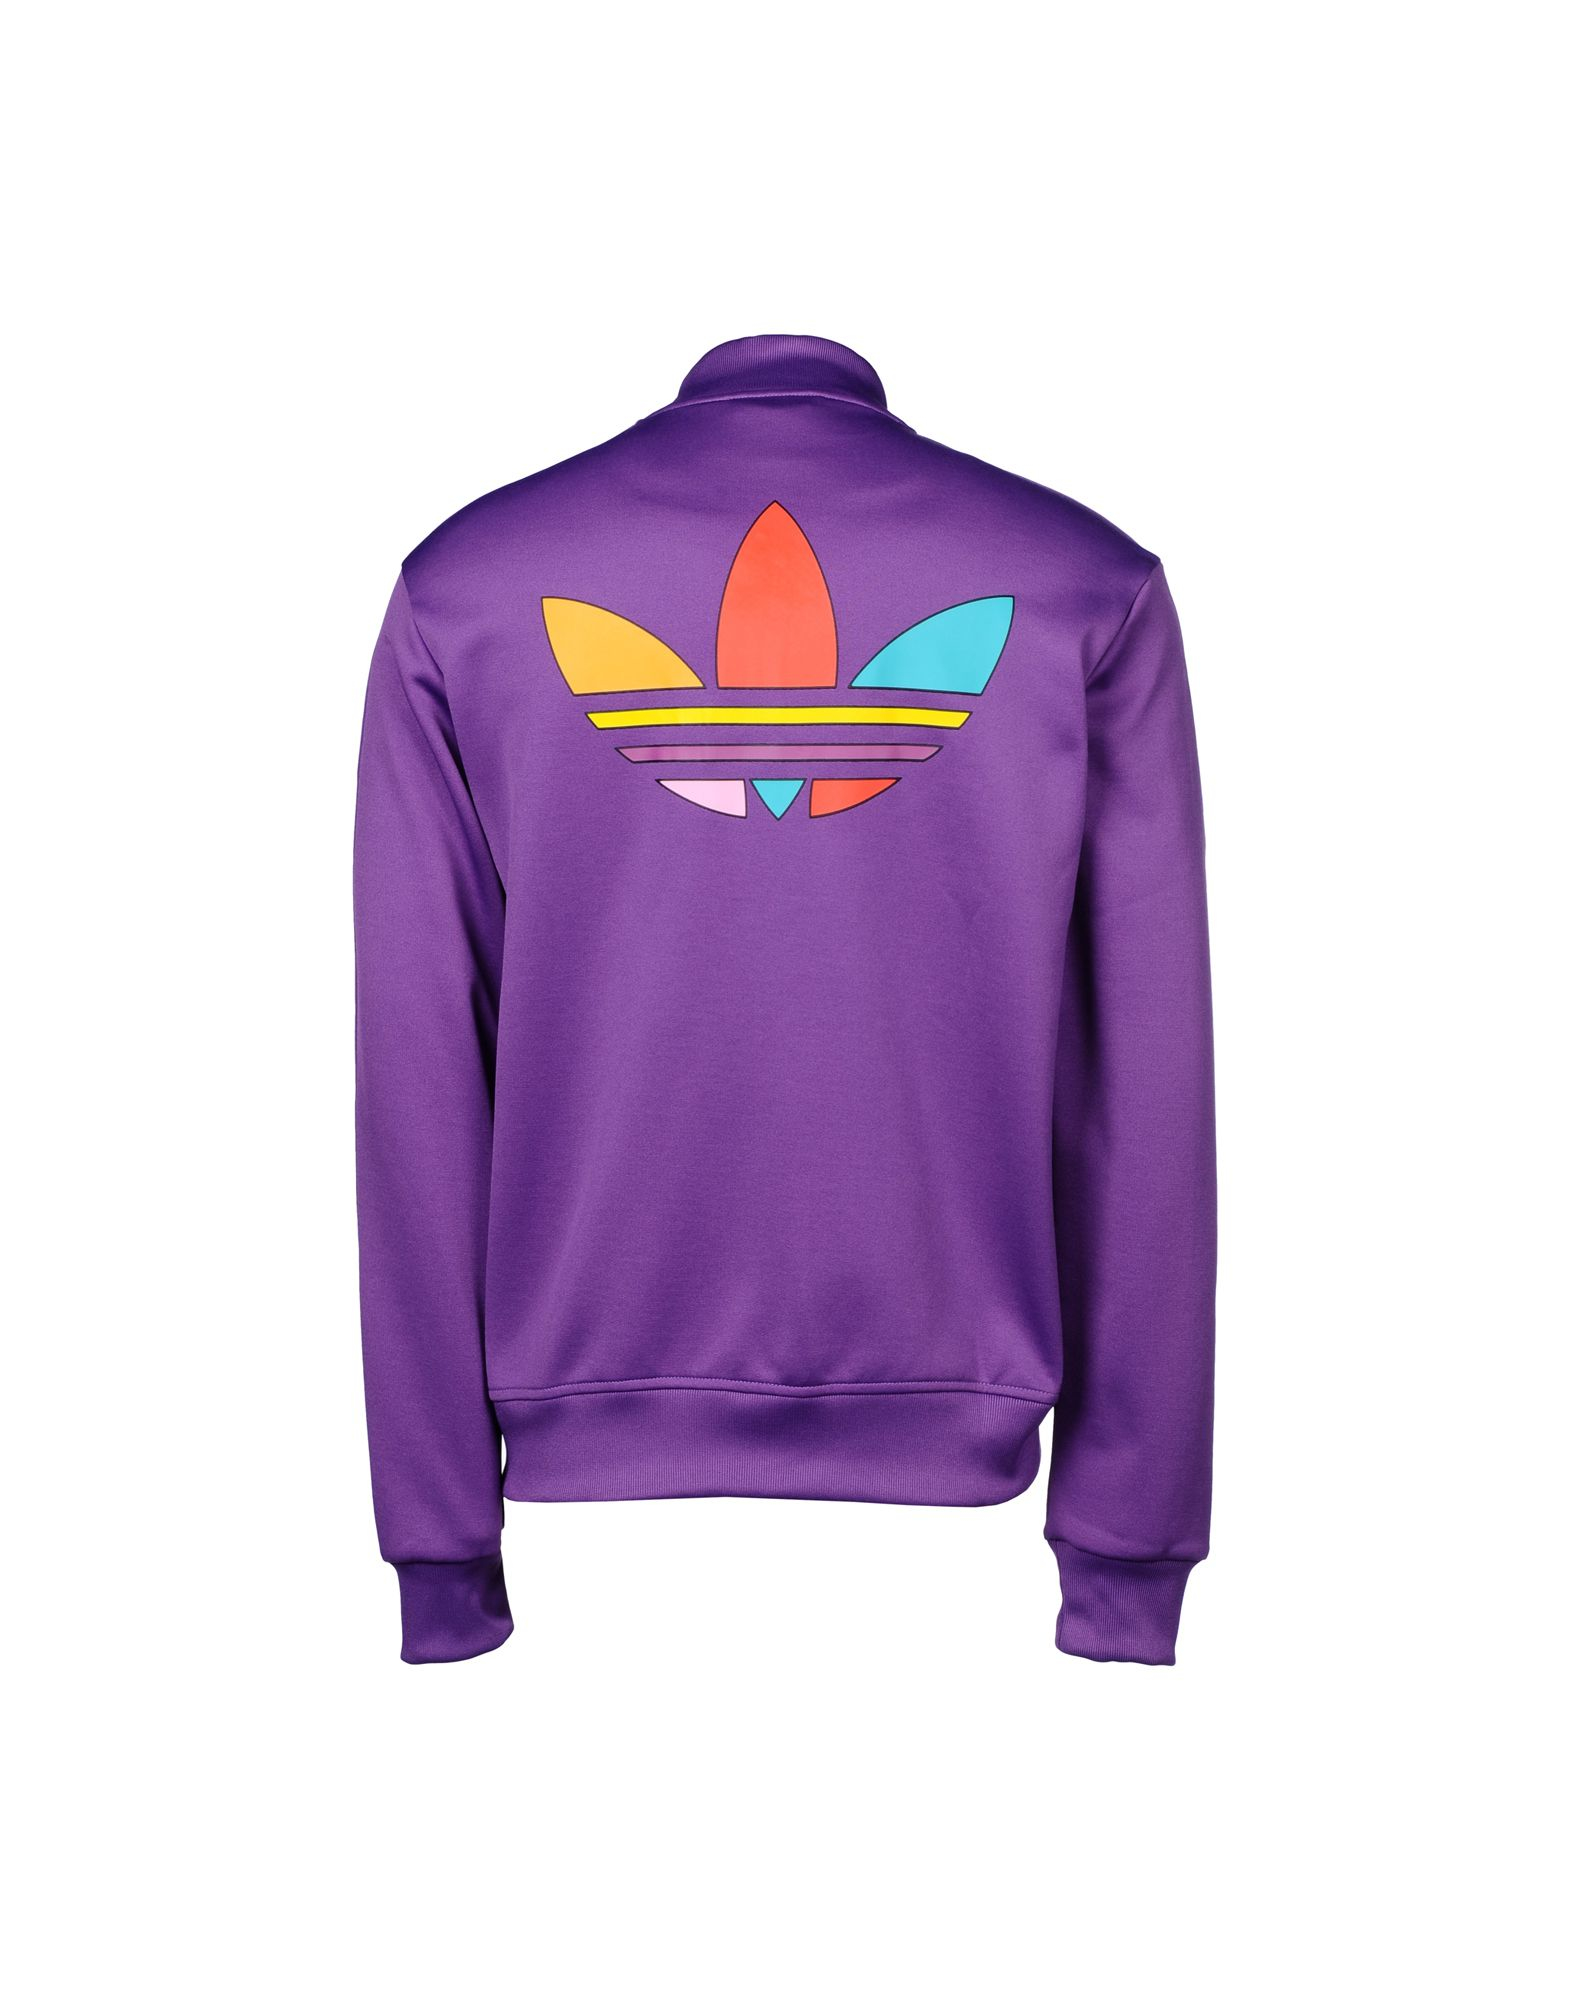 Adidas originals Sweatshirt in Purple for Men | Lyst